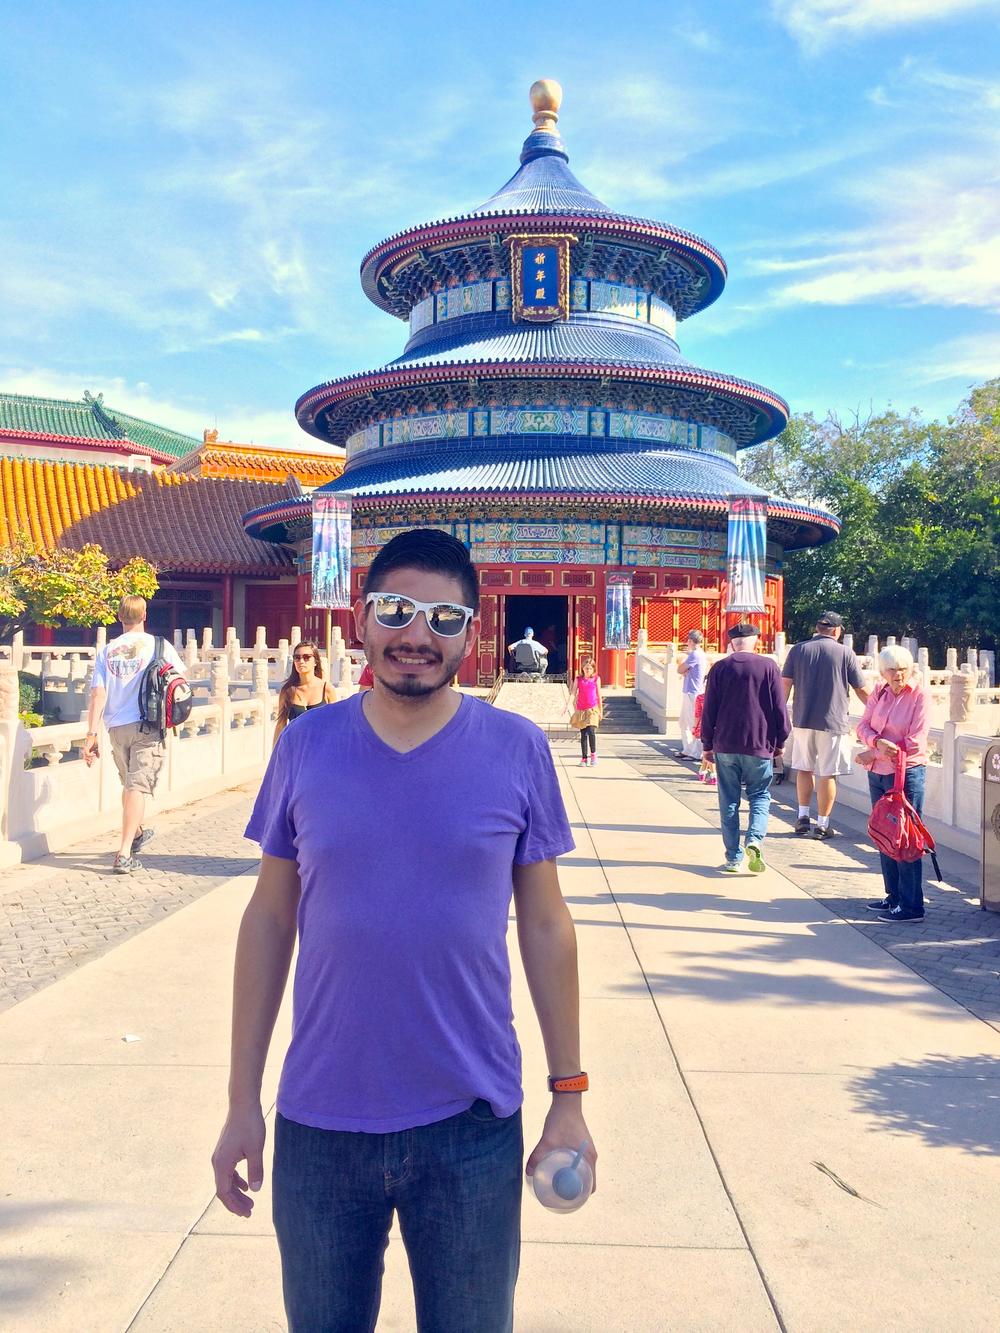 china-epcot-exterior.jpg